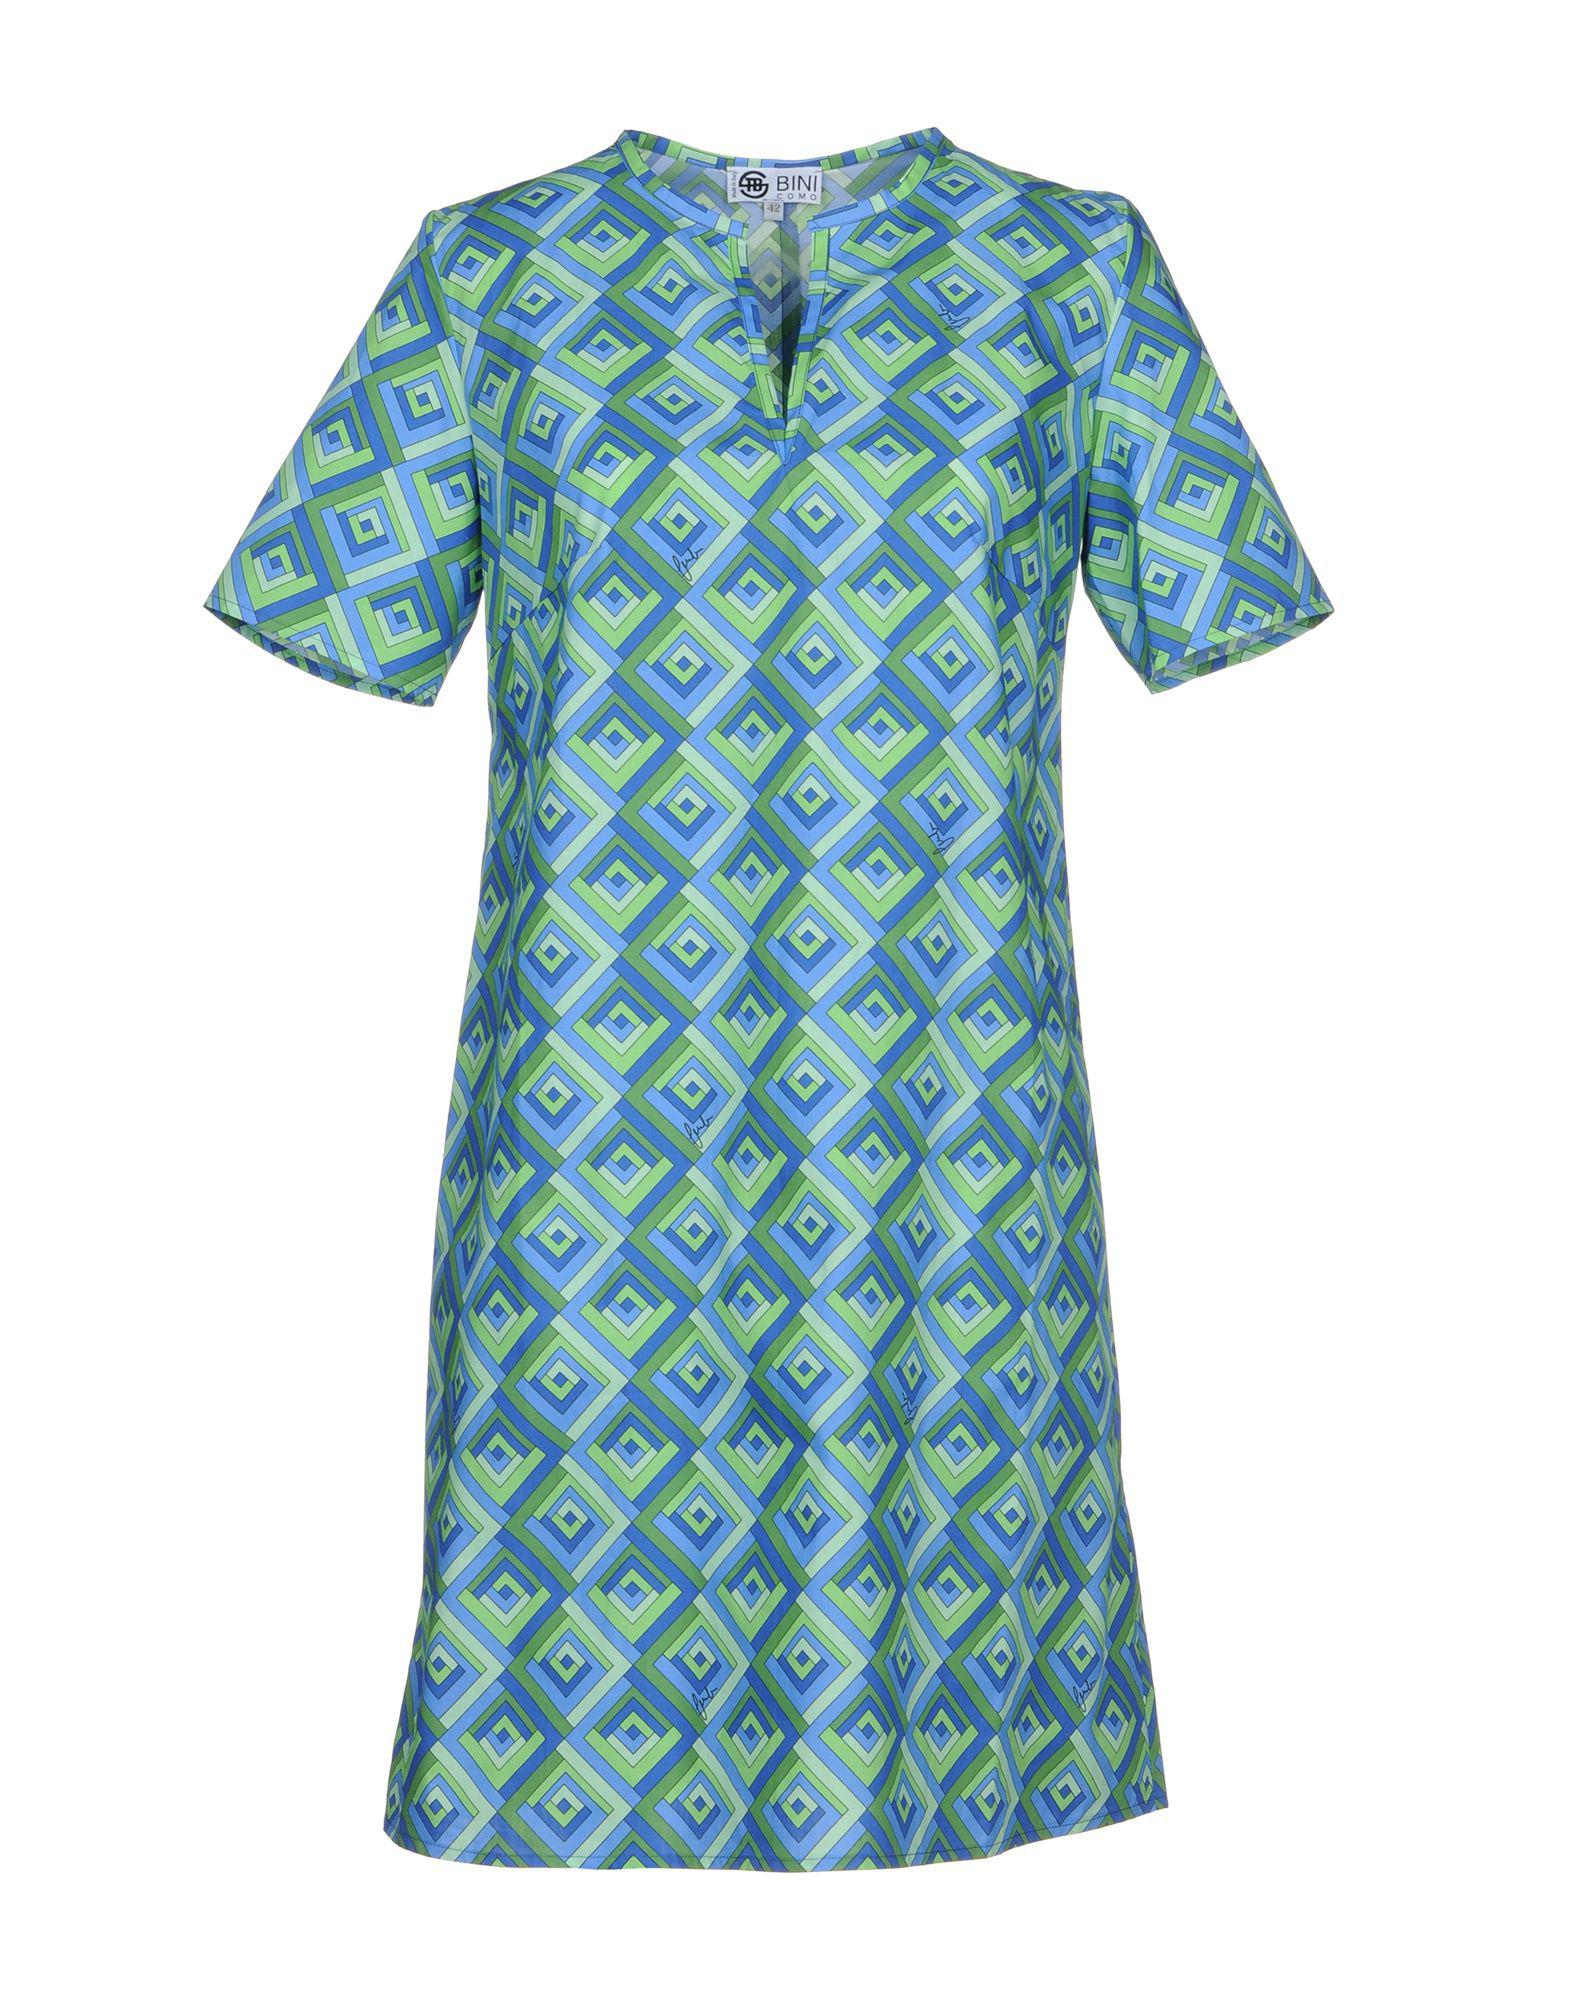 DRESSES - Short dresses Bini Como For Sale 2018 DvQ5fTD